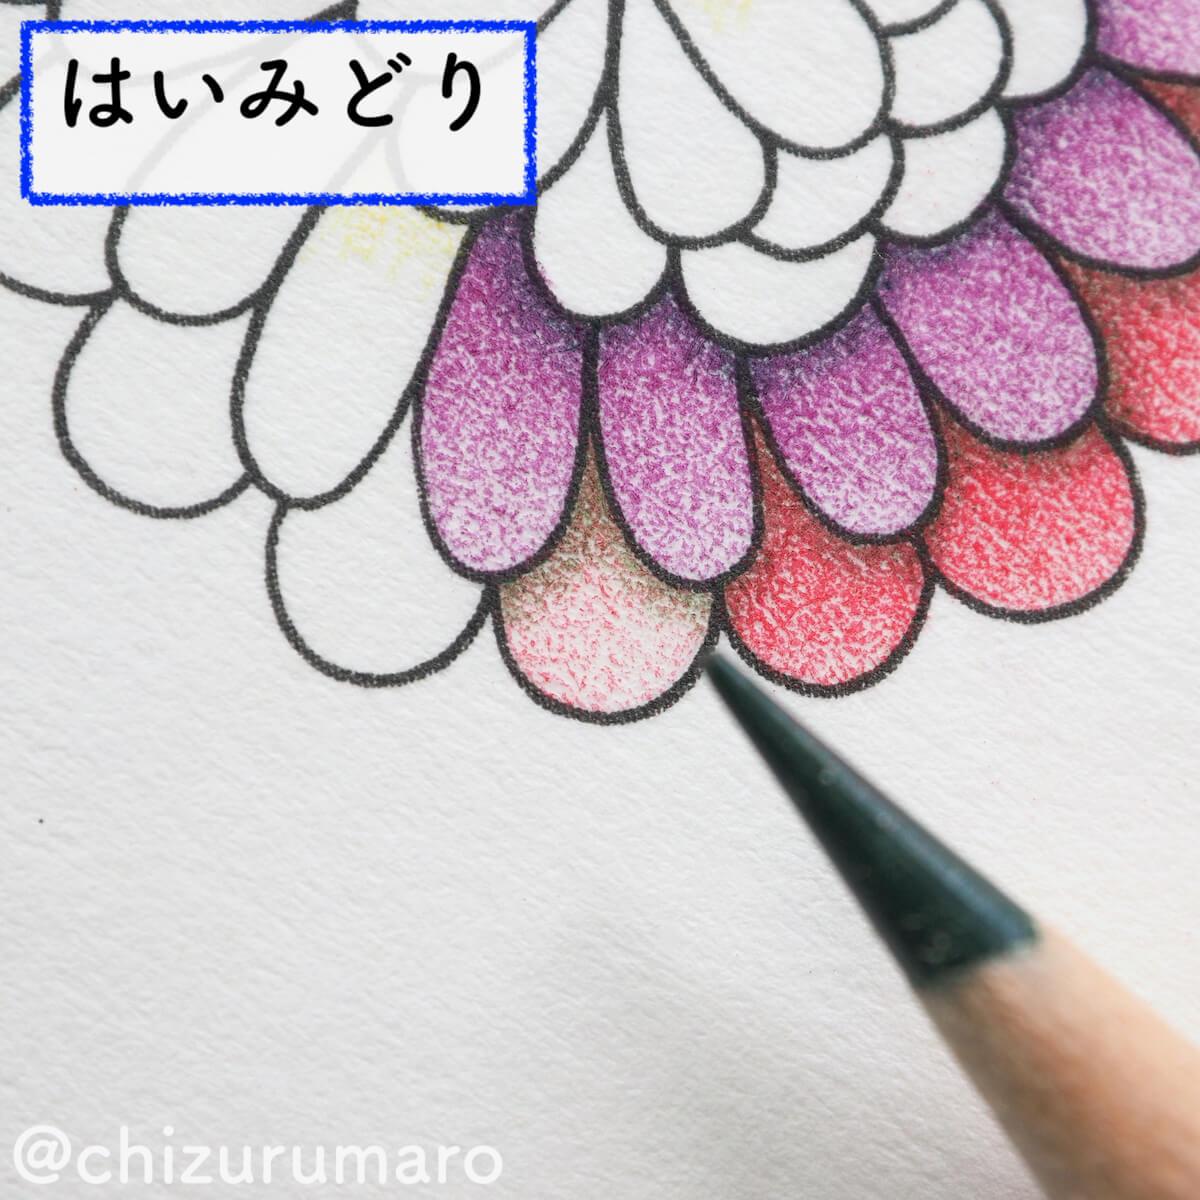 f:id:chizurumaro:20200326115008j:plain